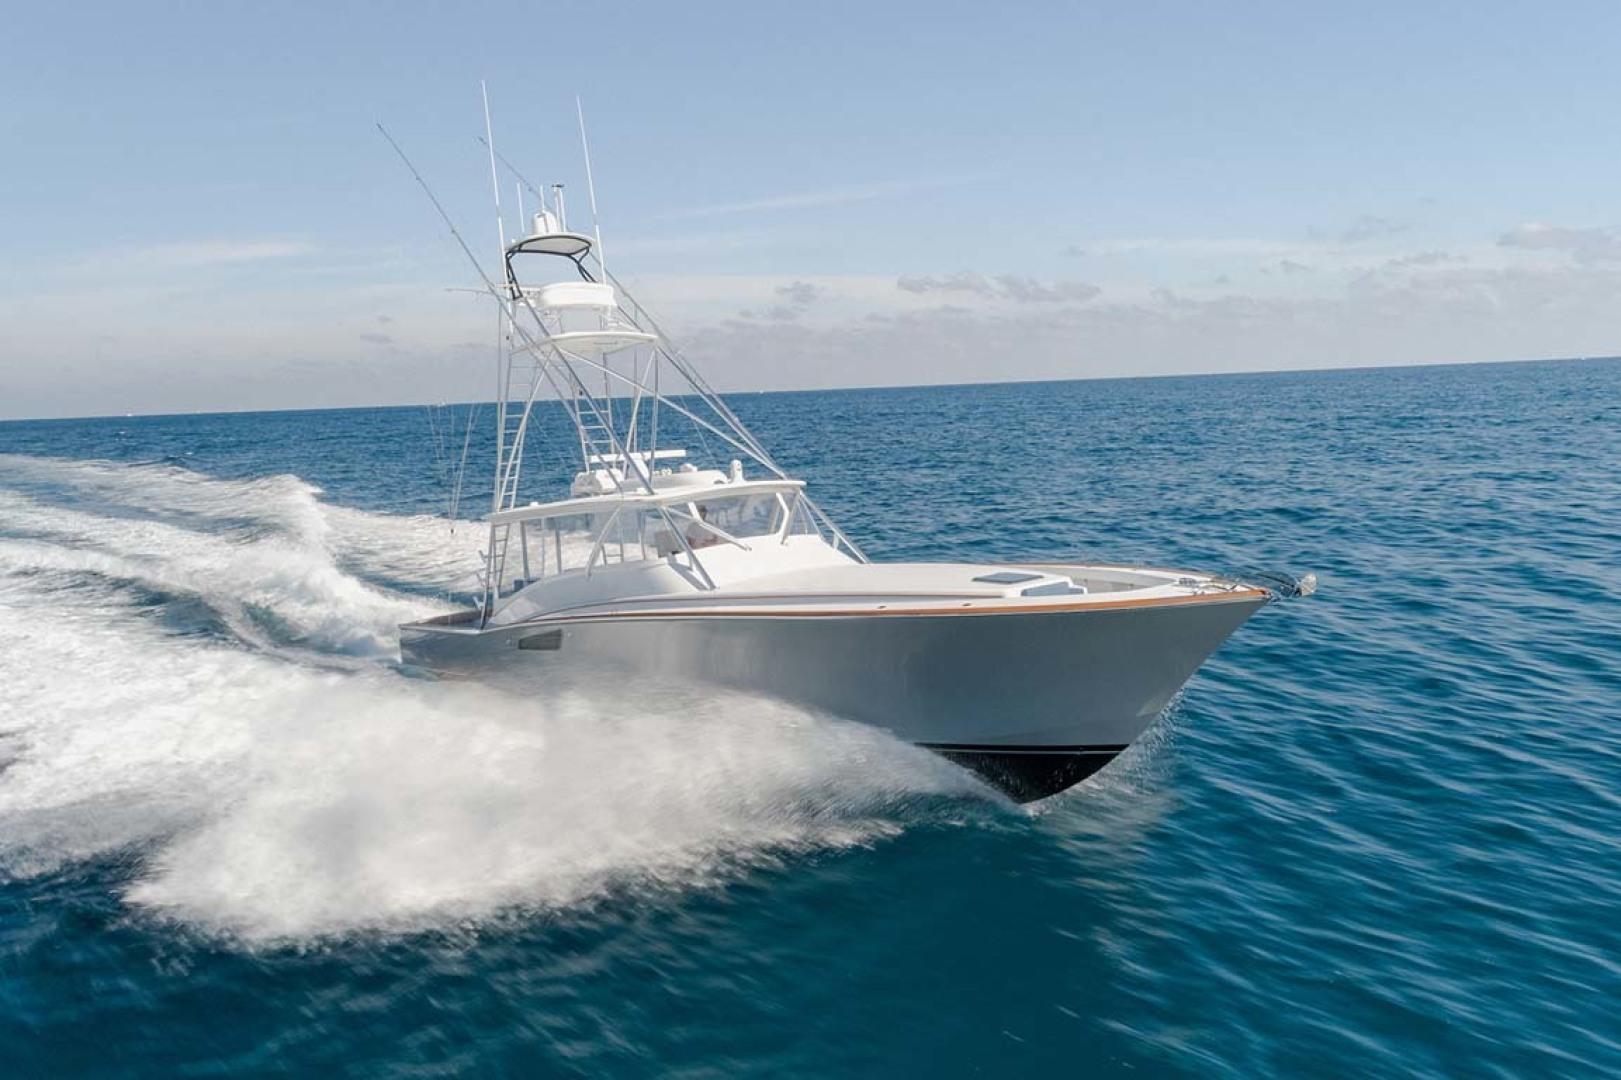 Jim Smith-Walkaround Express 2018-Eurybia North Palm Beach-Florida-United States-Starboard Running View-1573765   Thumbnail